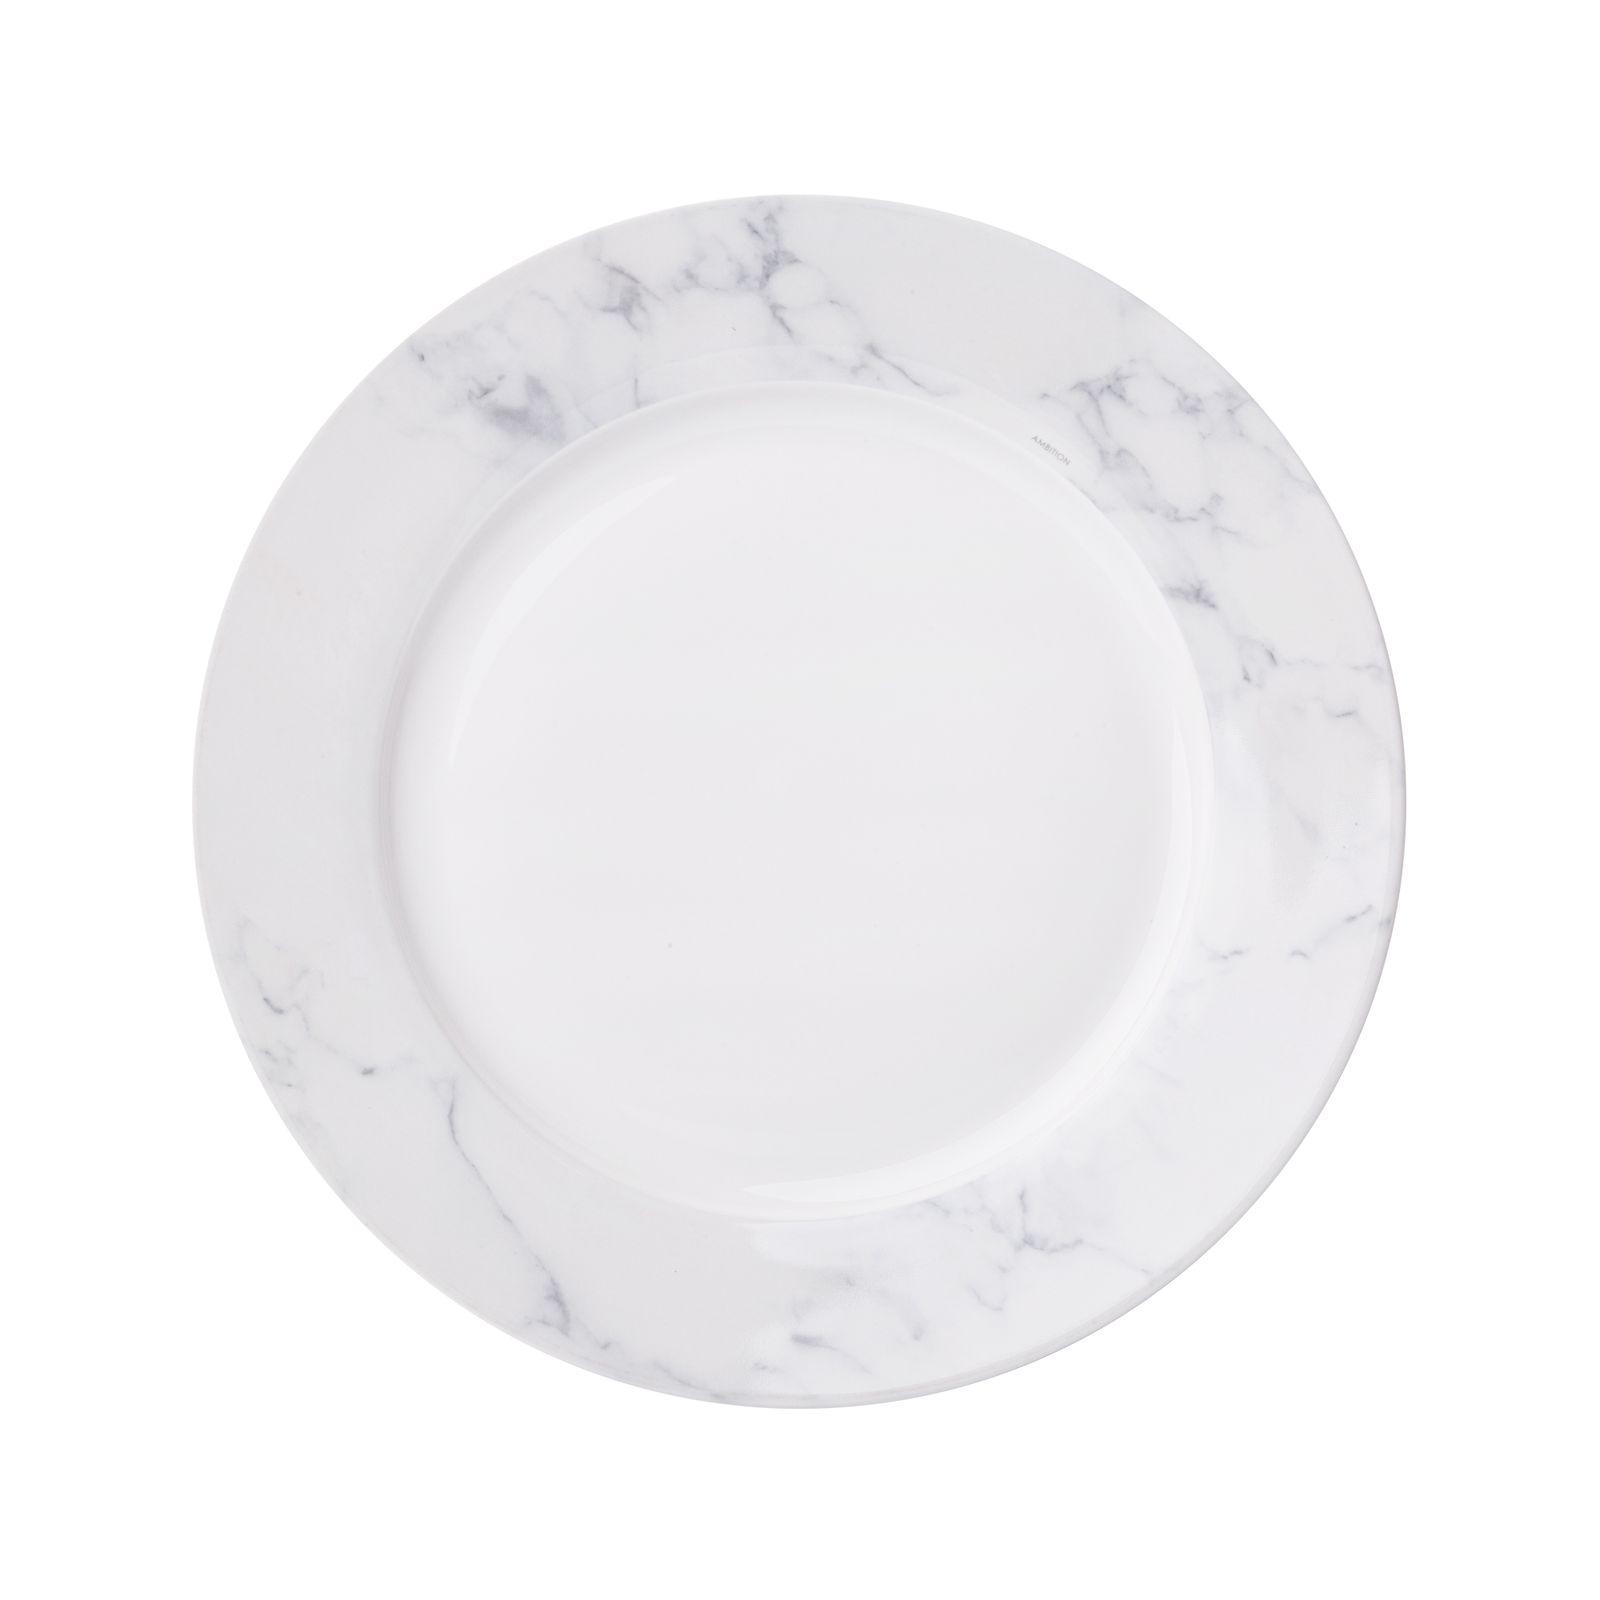 Talerz deserowy 19 cm Marble AMBITION